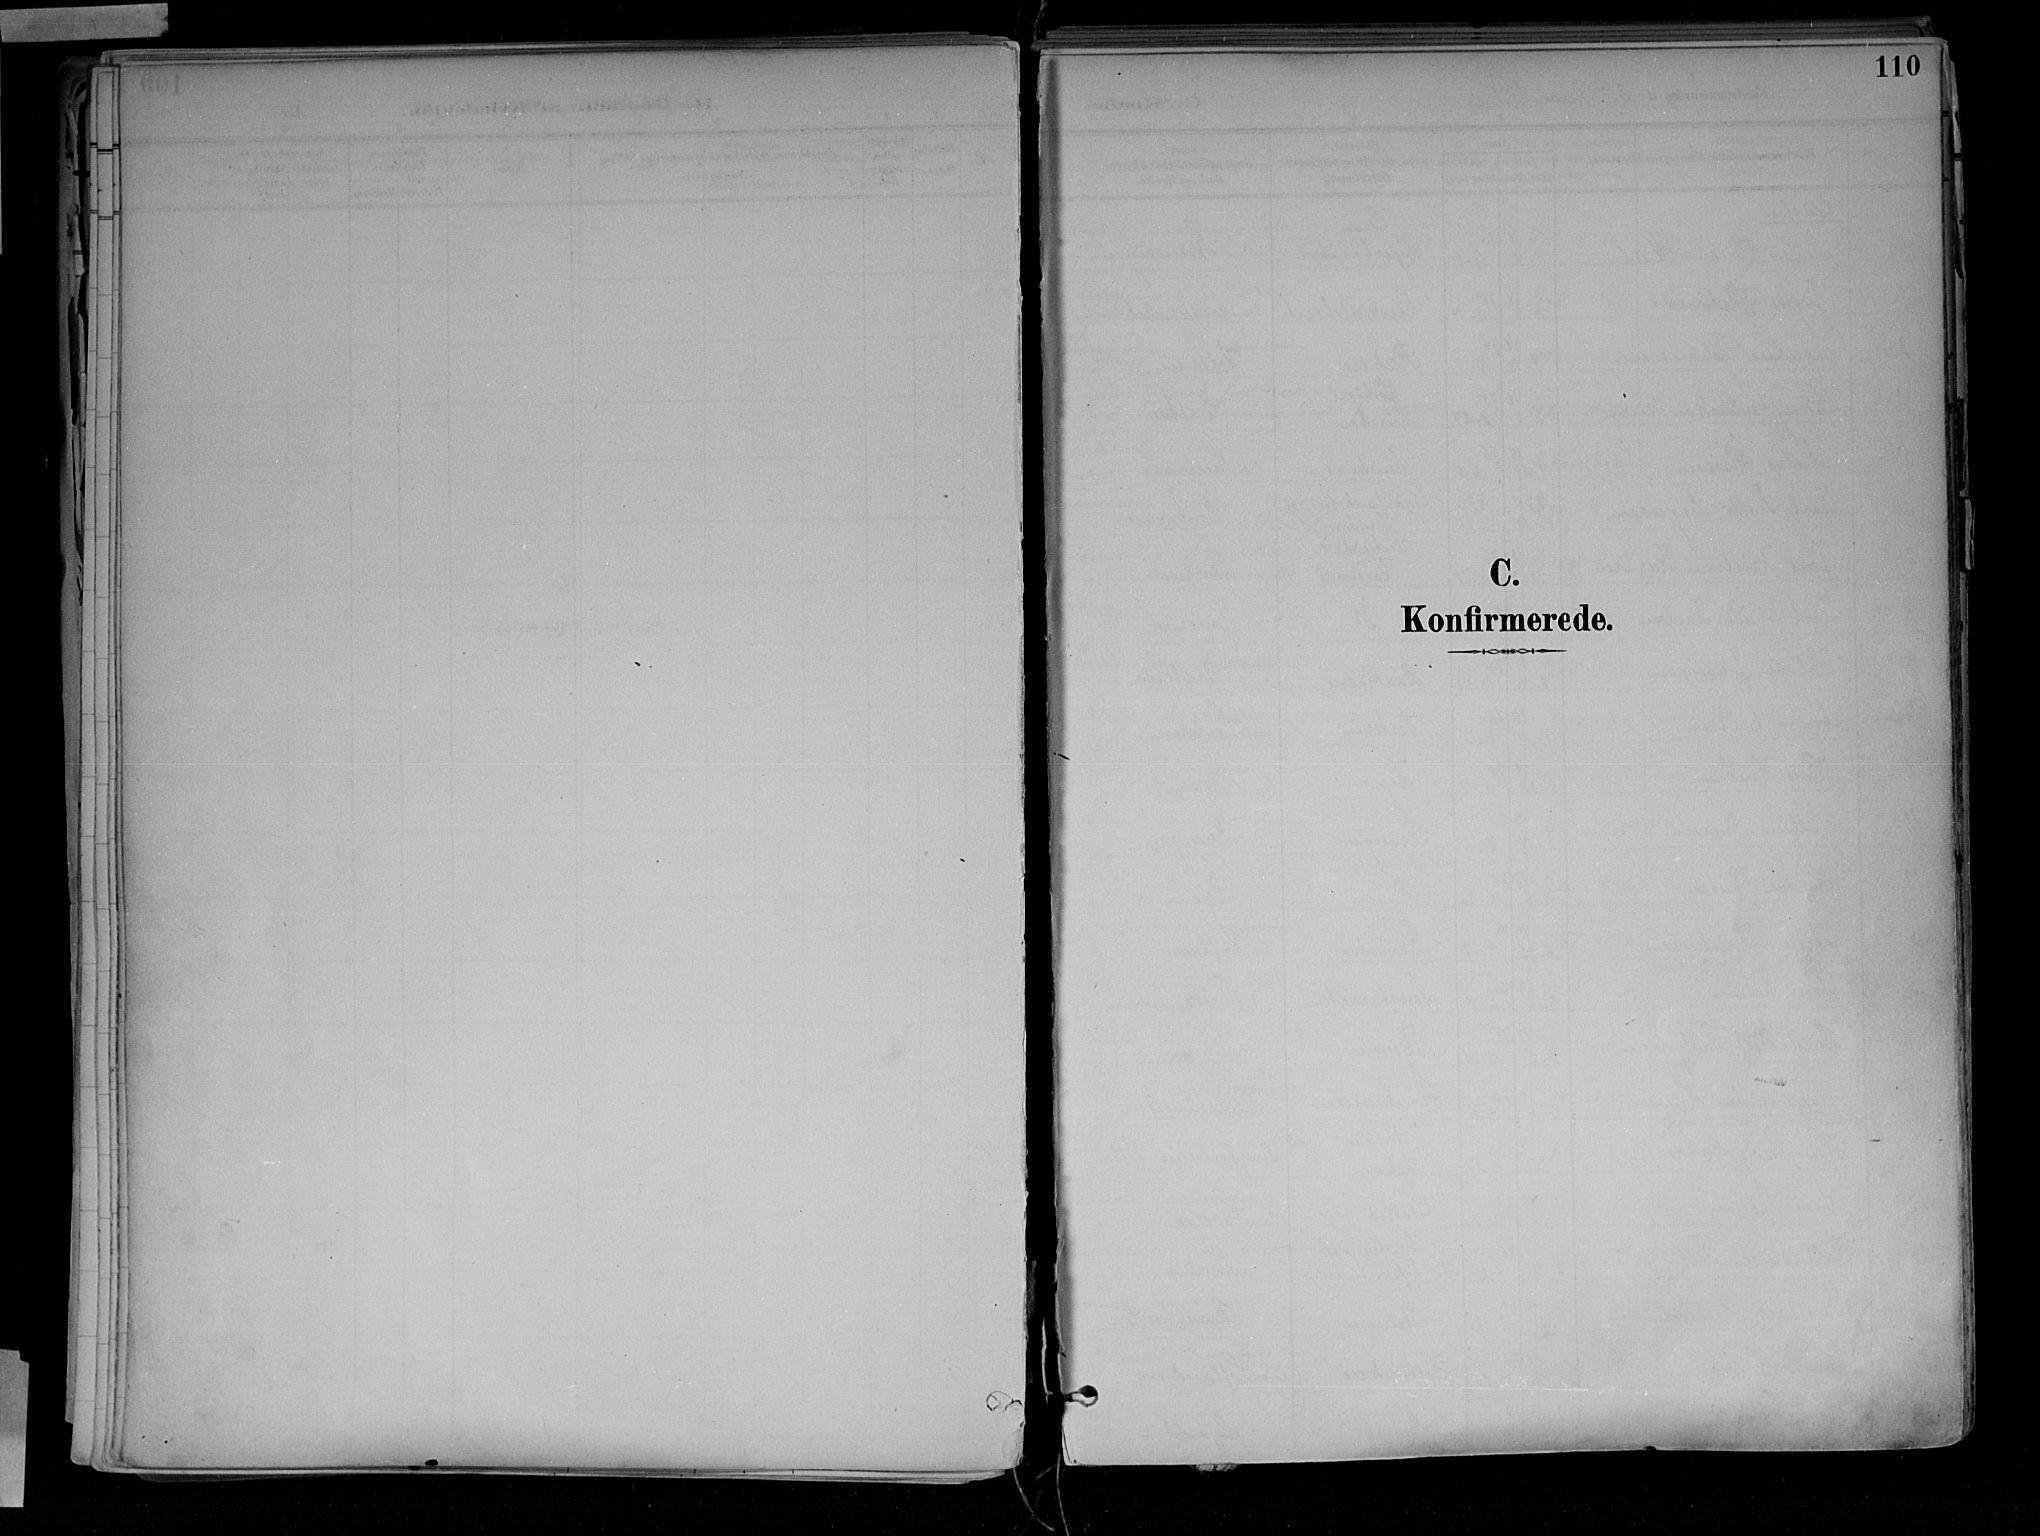 SAH, Jevnaker prestekontor, Ministerialbok nr. 10, 1891-1906, s. 110